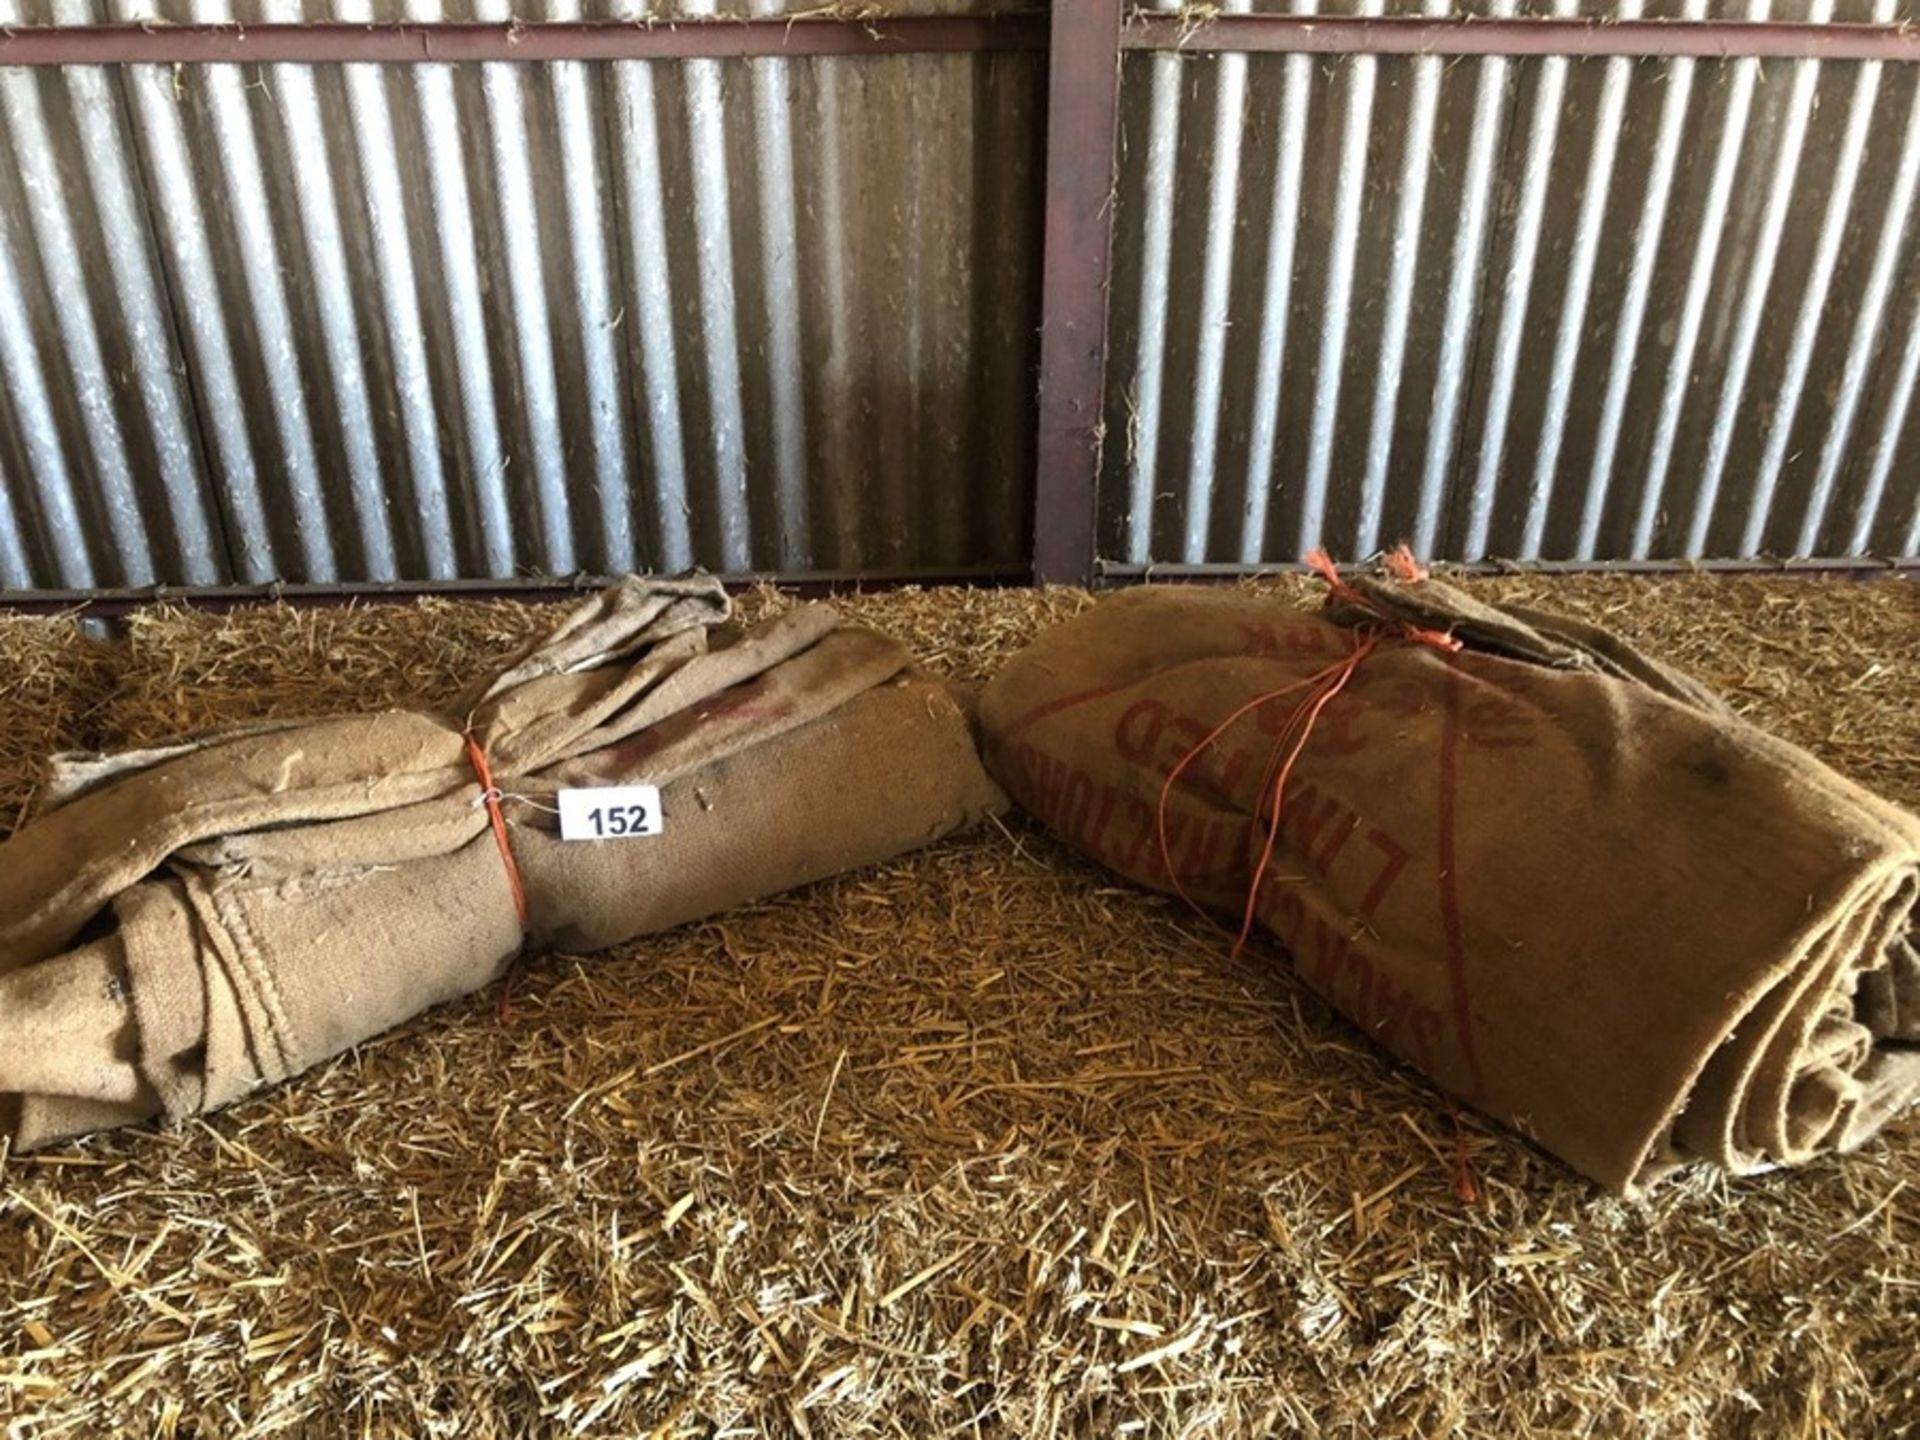 Qty hessian sacks - Image 2 of 2